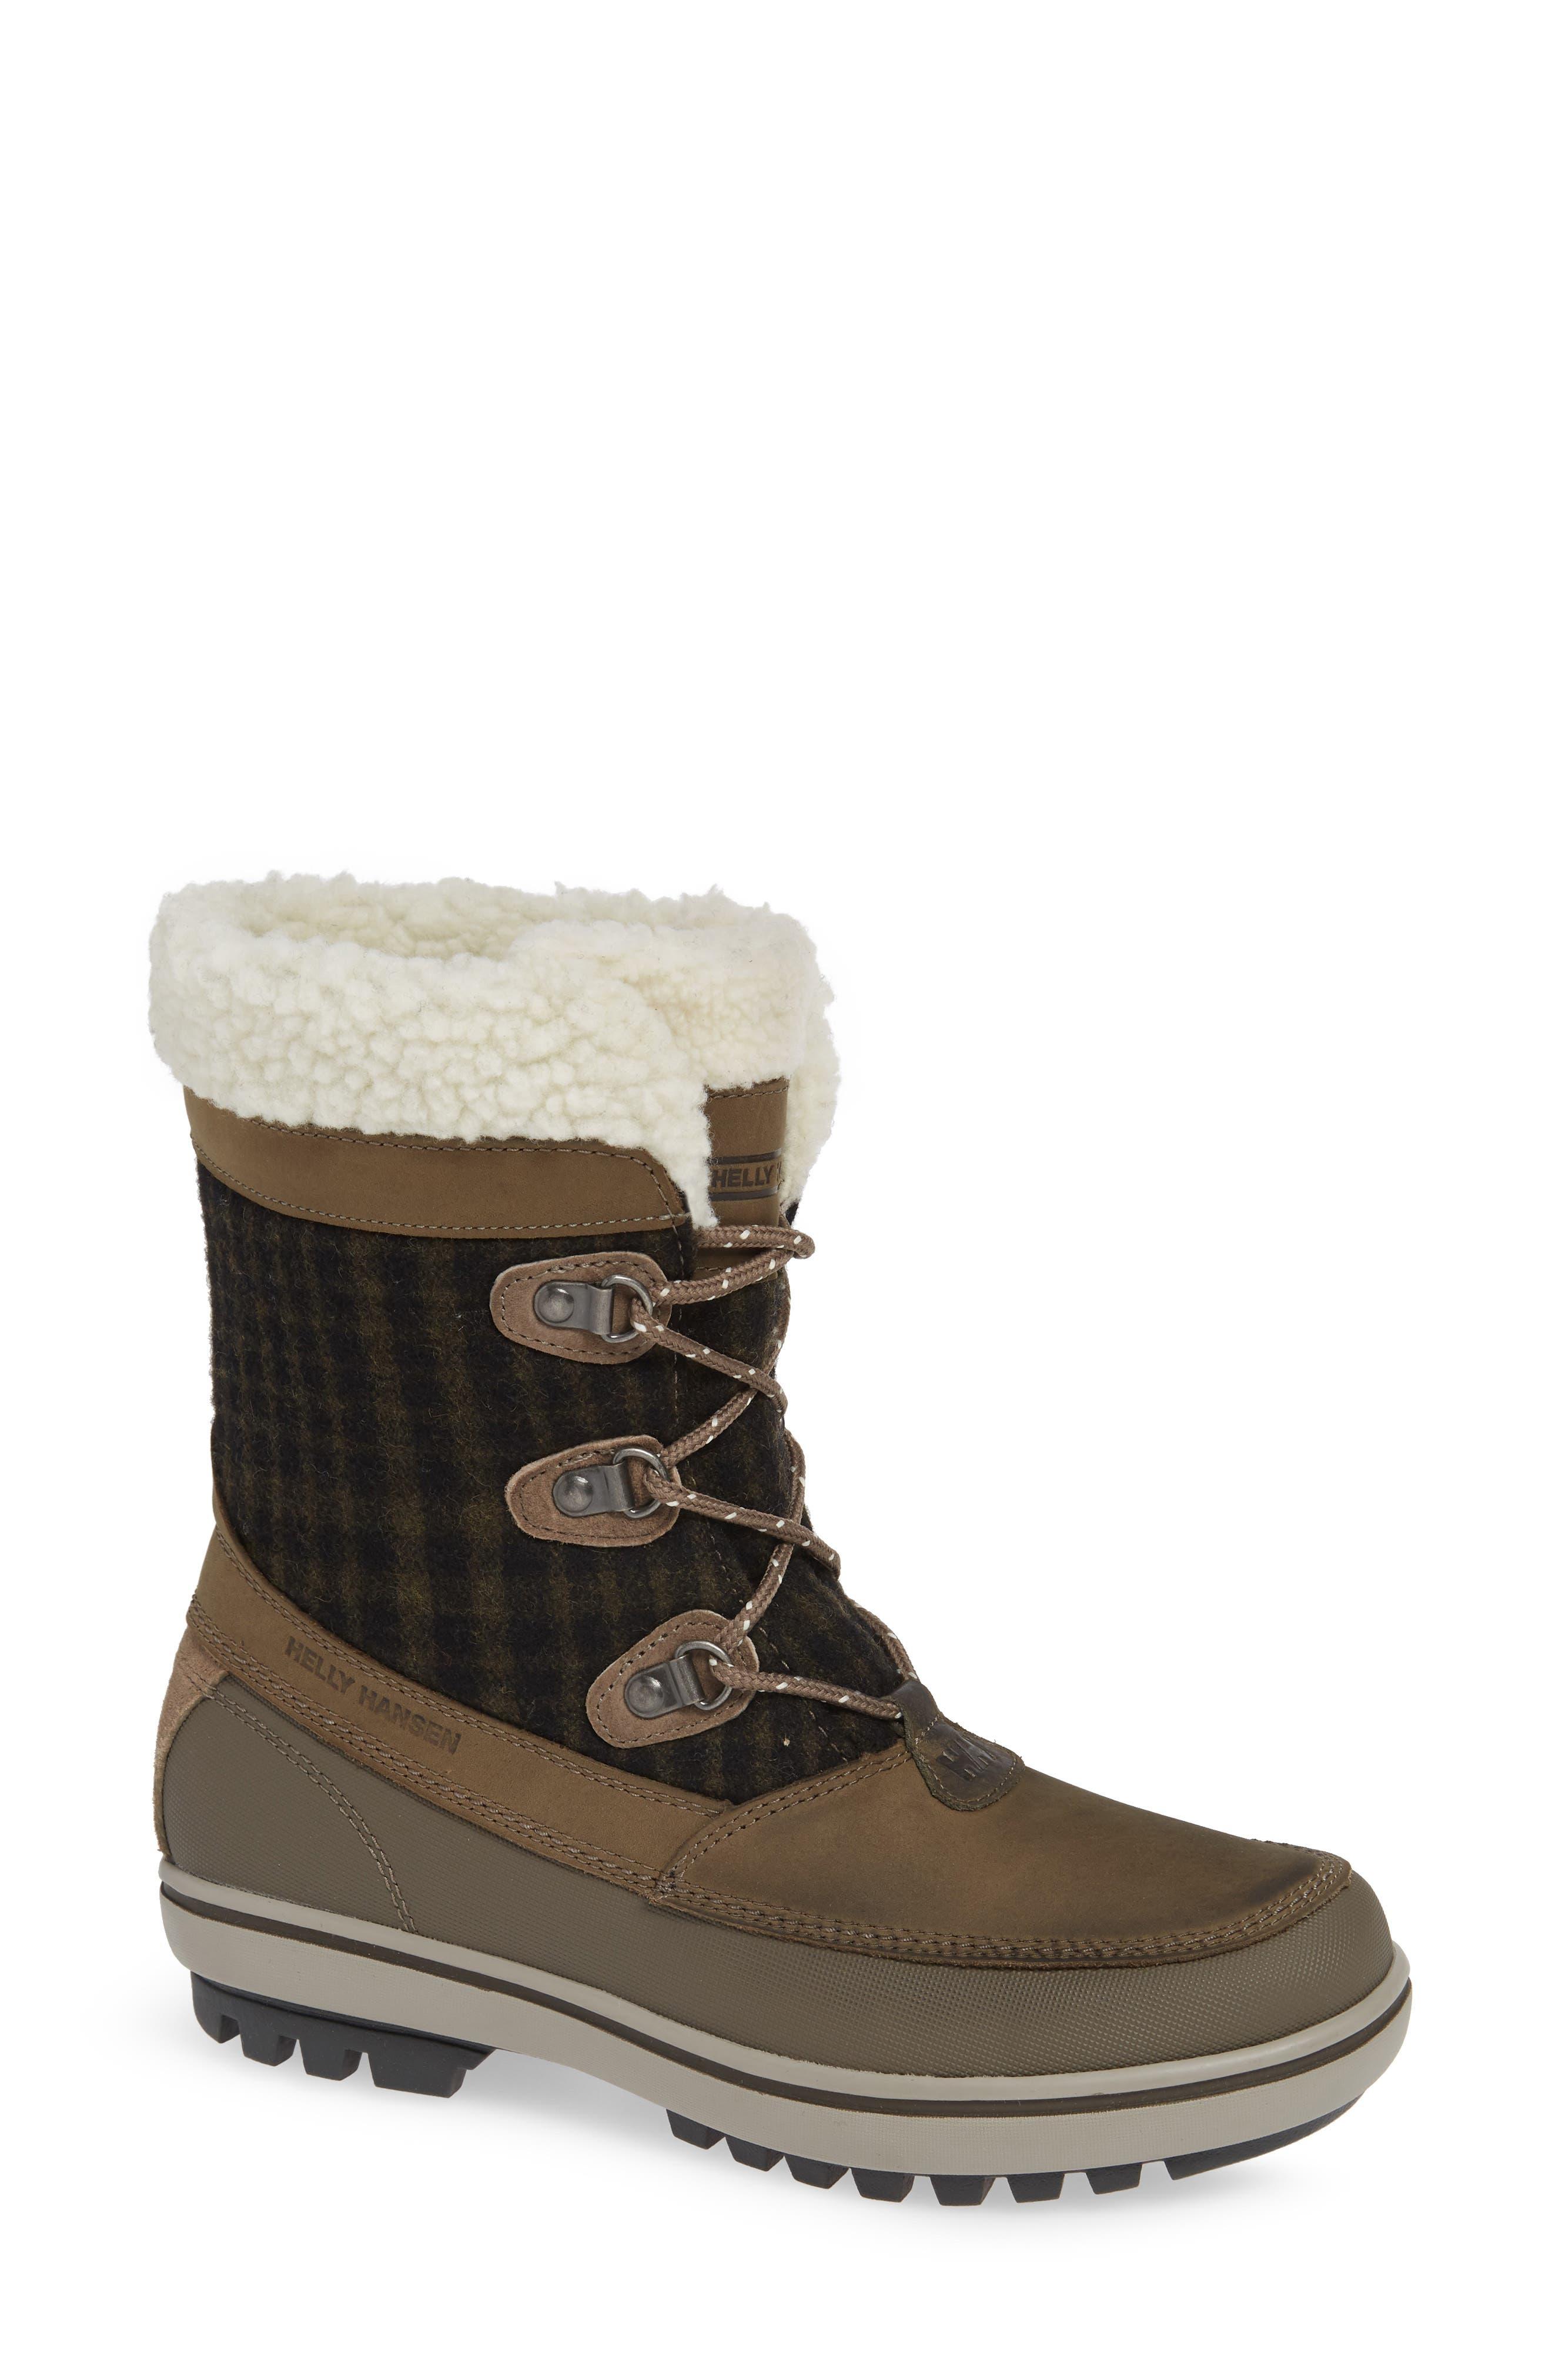 Helly Hansen Georgina Snow Waterproof Boot, Brown